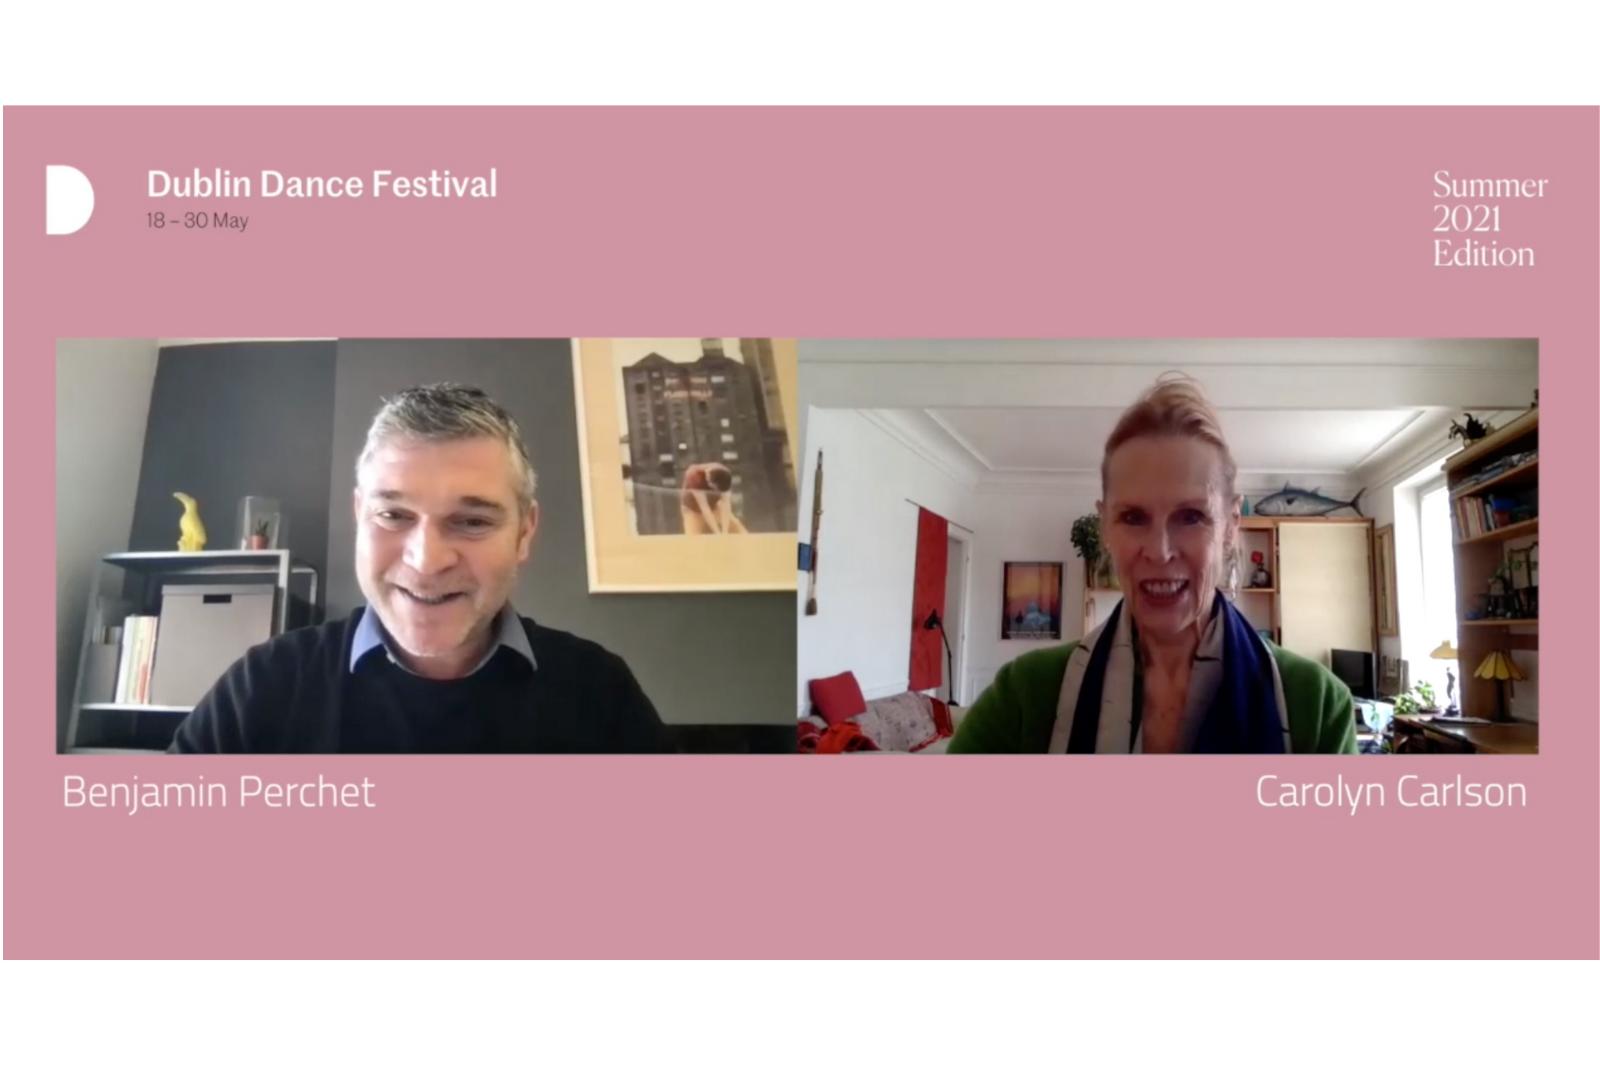 Carolyn Carlson in conversation with DDF Artistic Director Benjamin Perchet